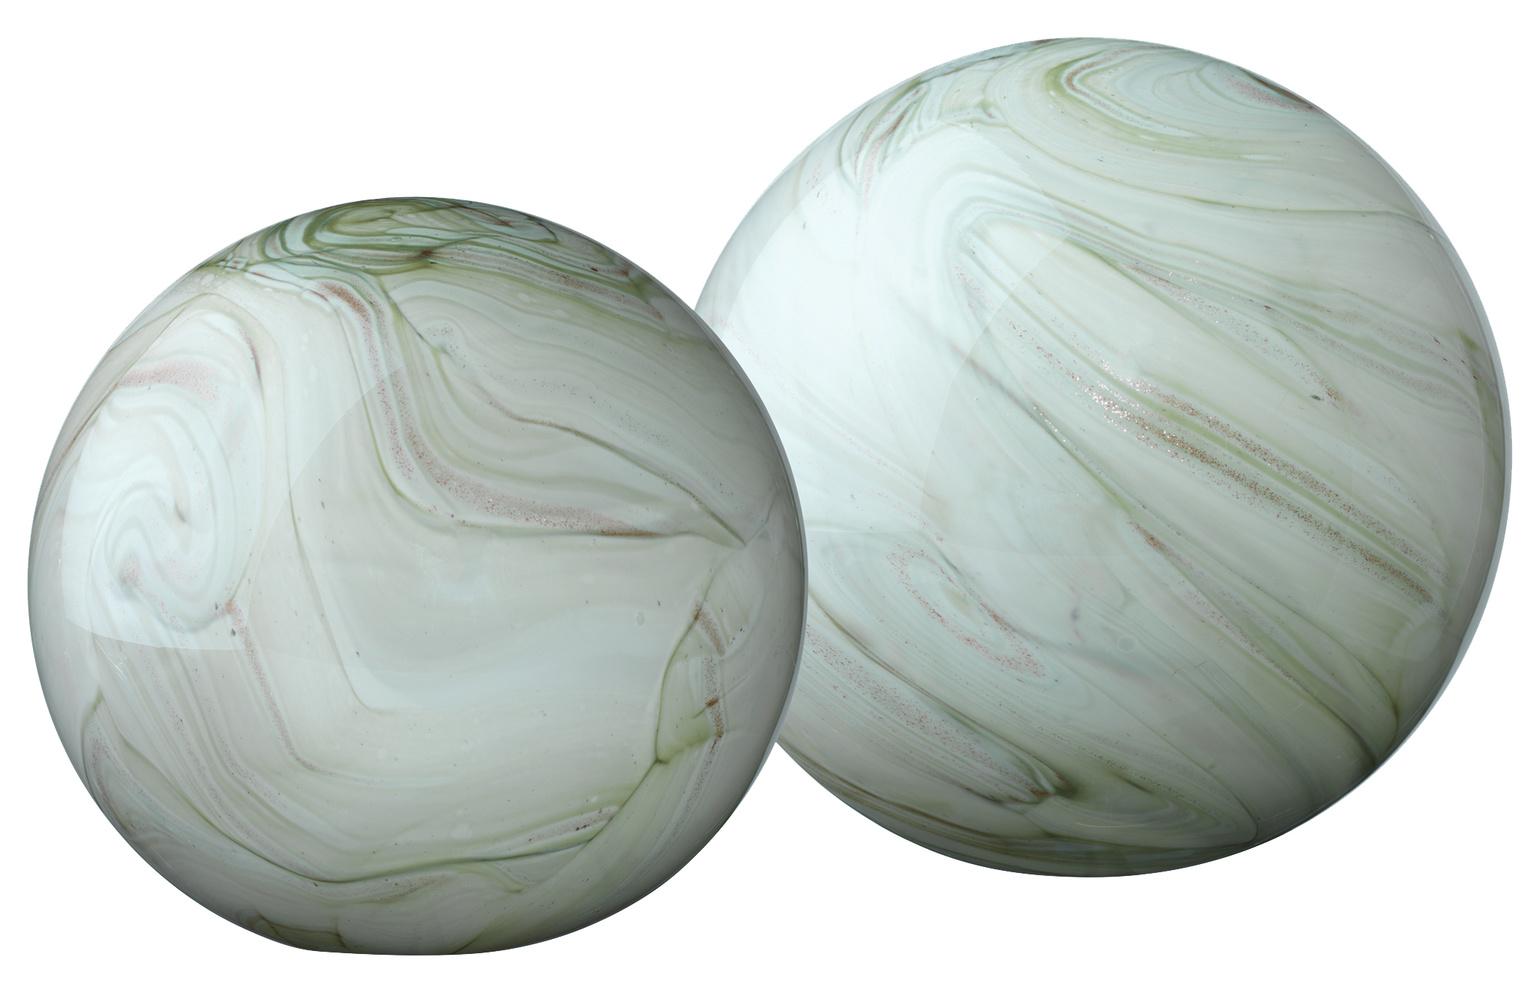 7cosm basa cosmosglassballs sageswirlglass%20set%20of%202%20copy